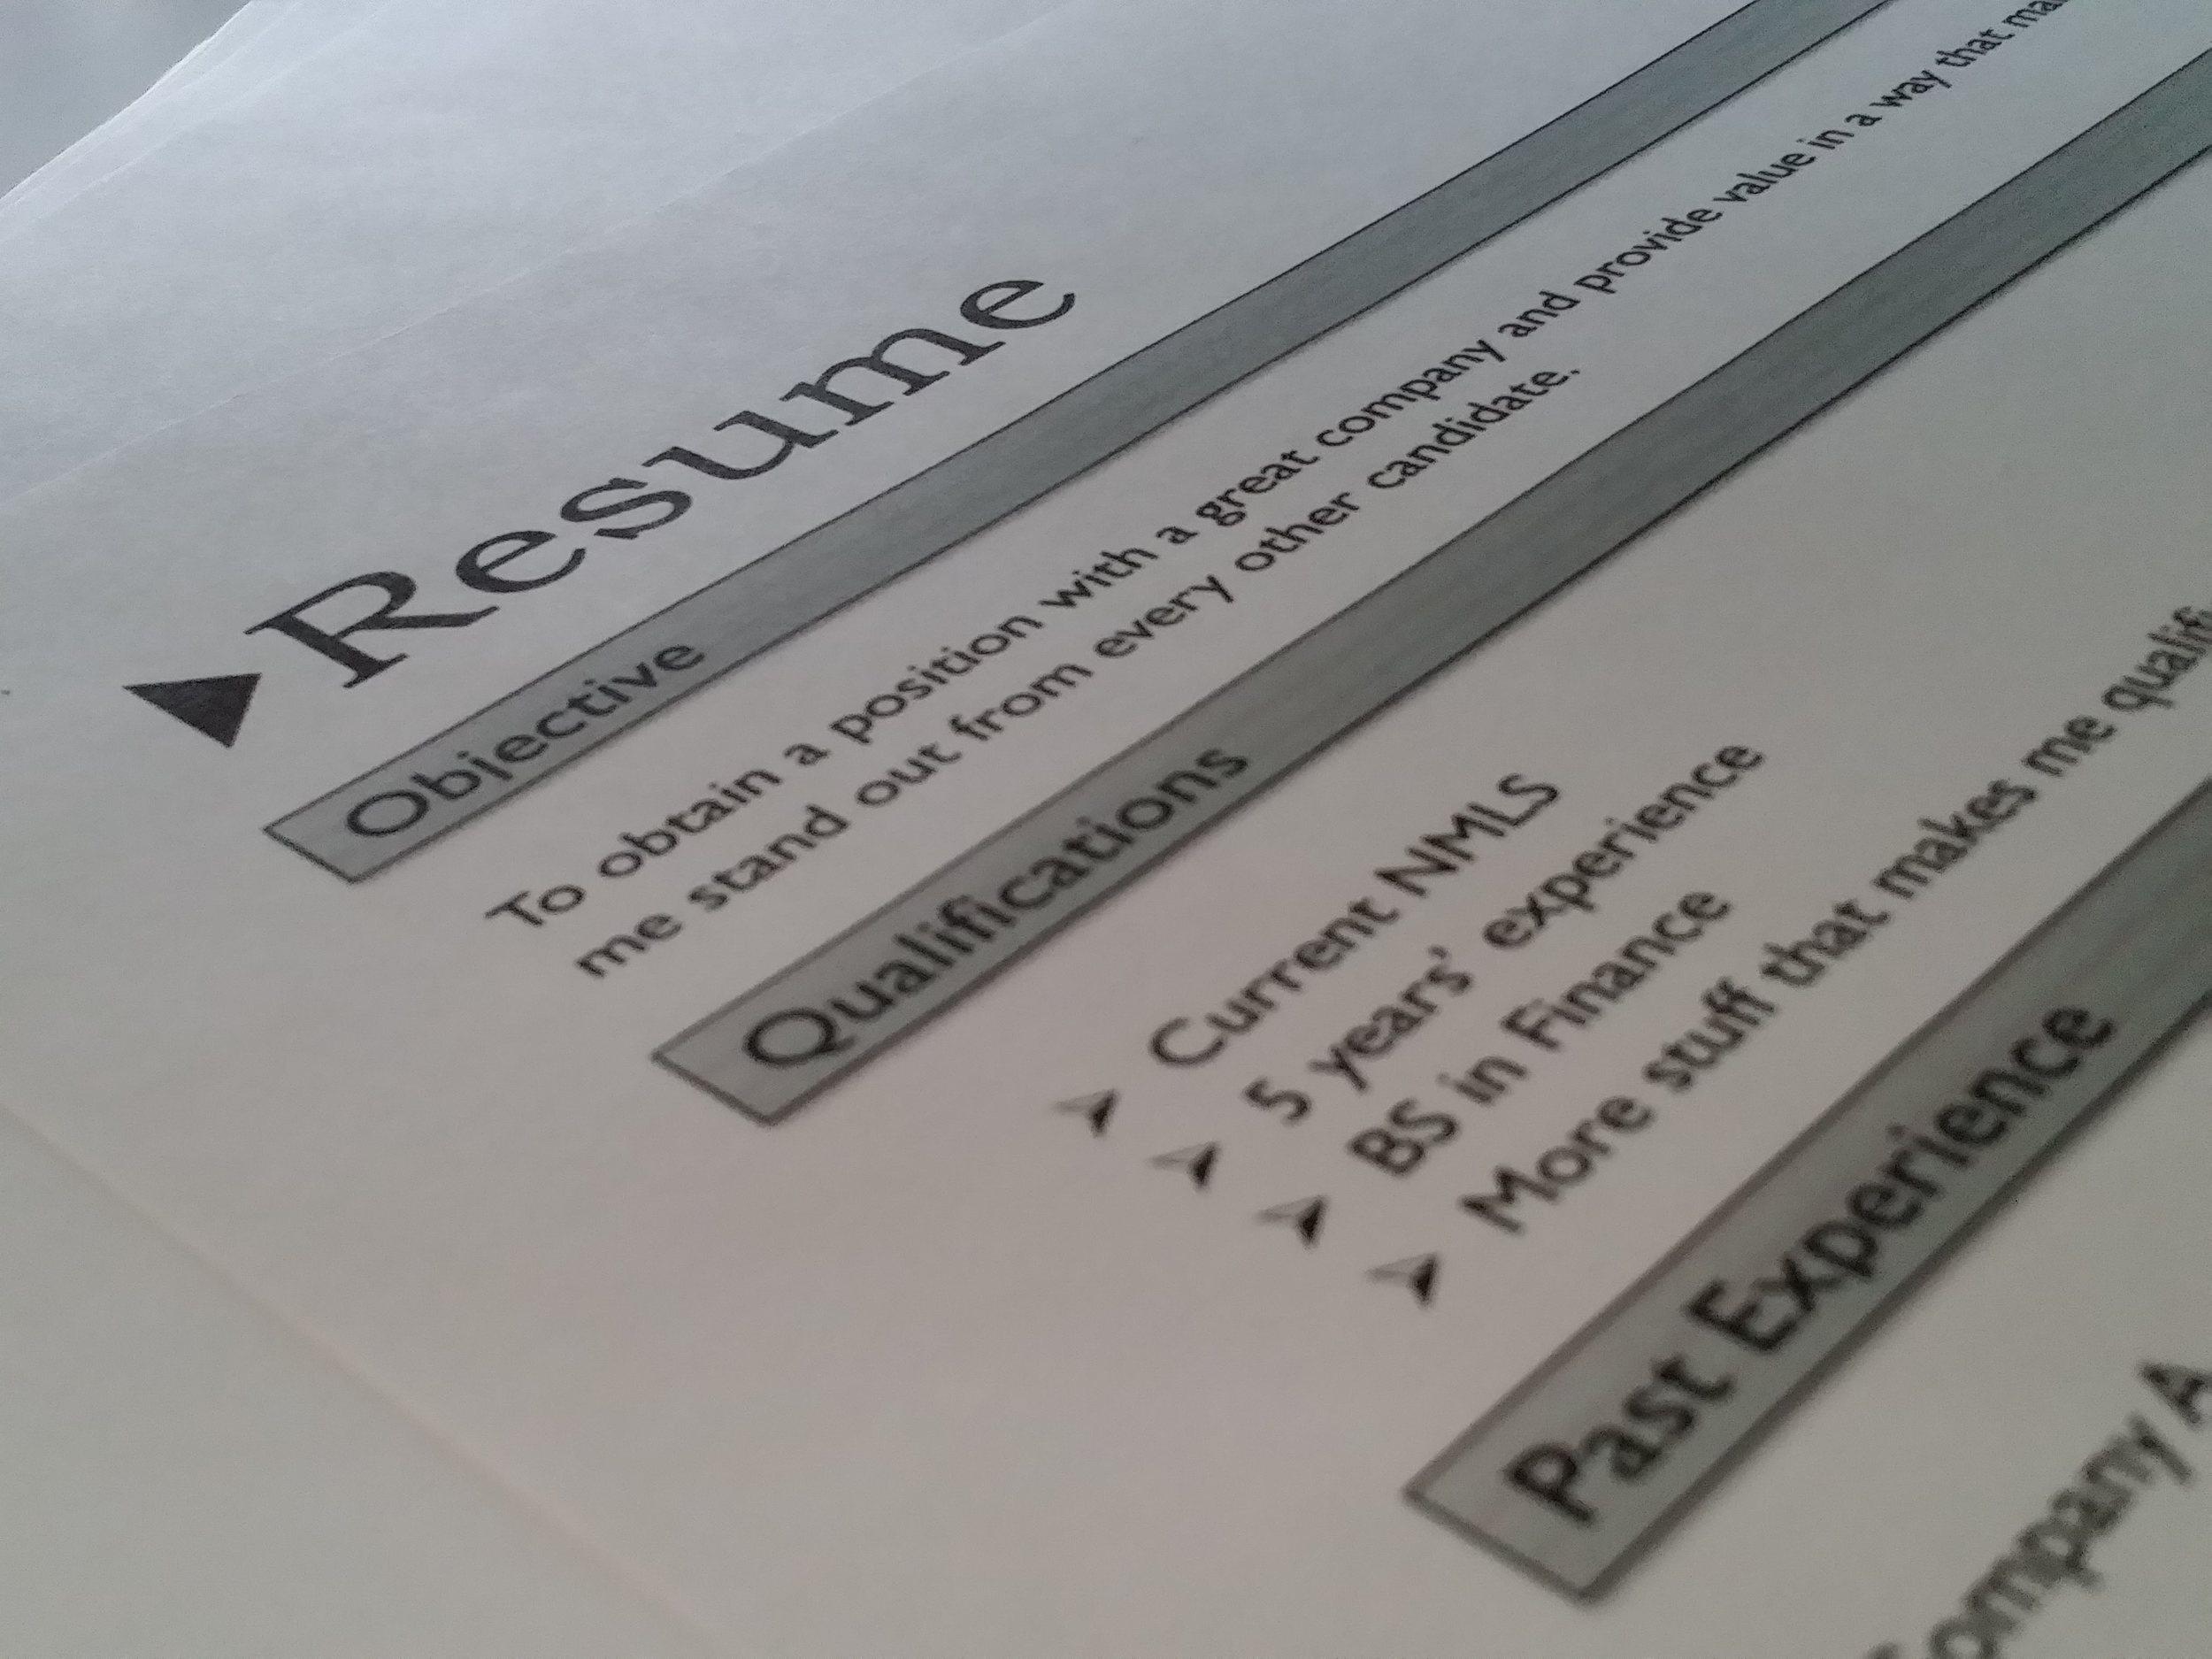 Recruiting Image.jpg